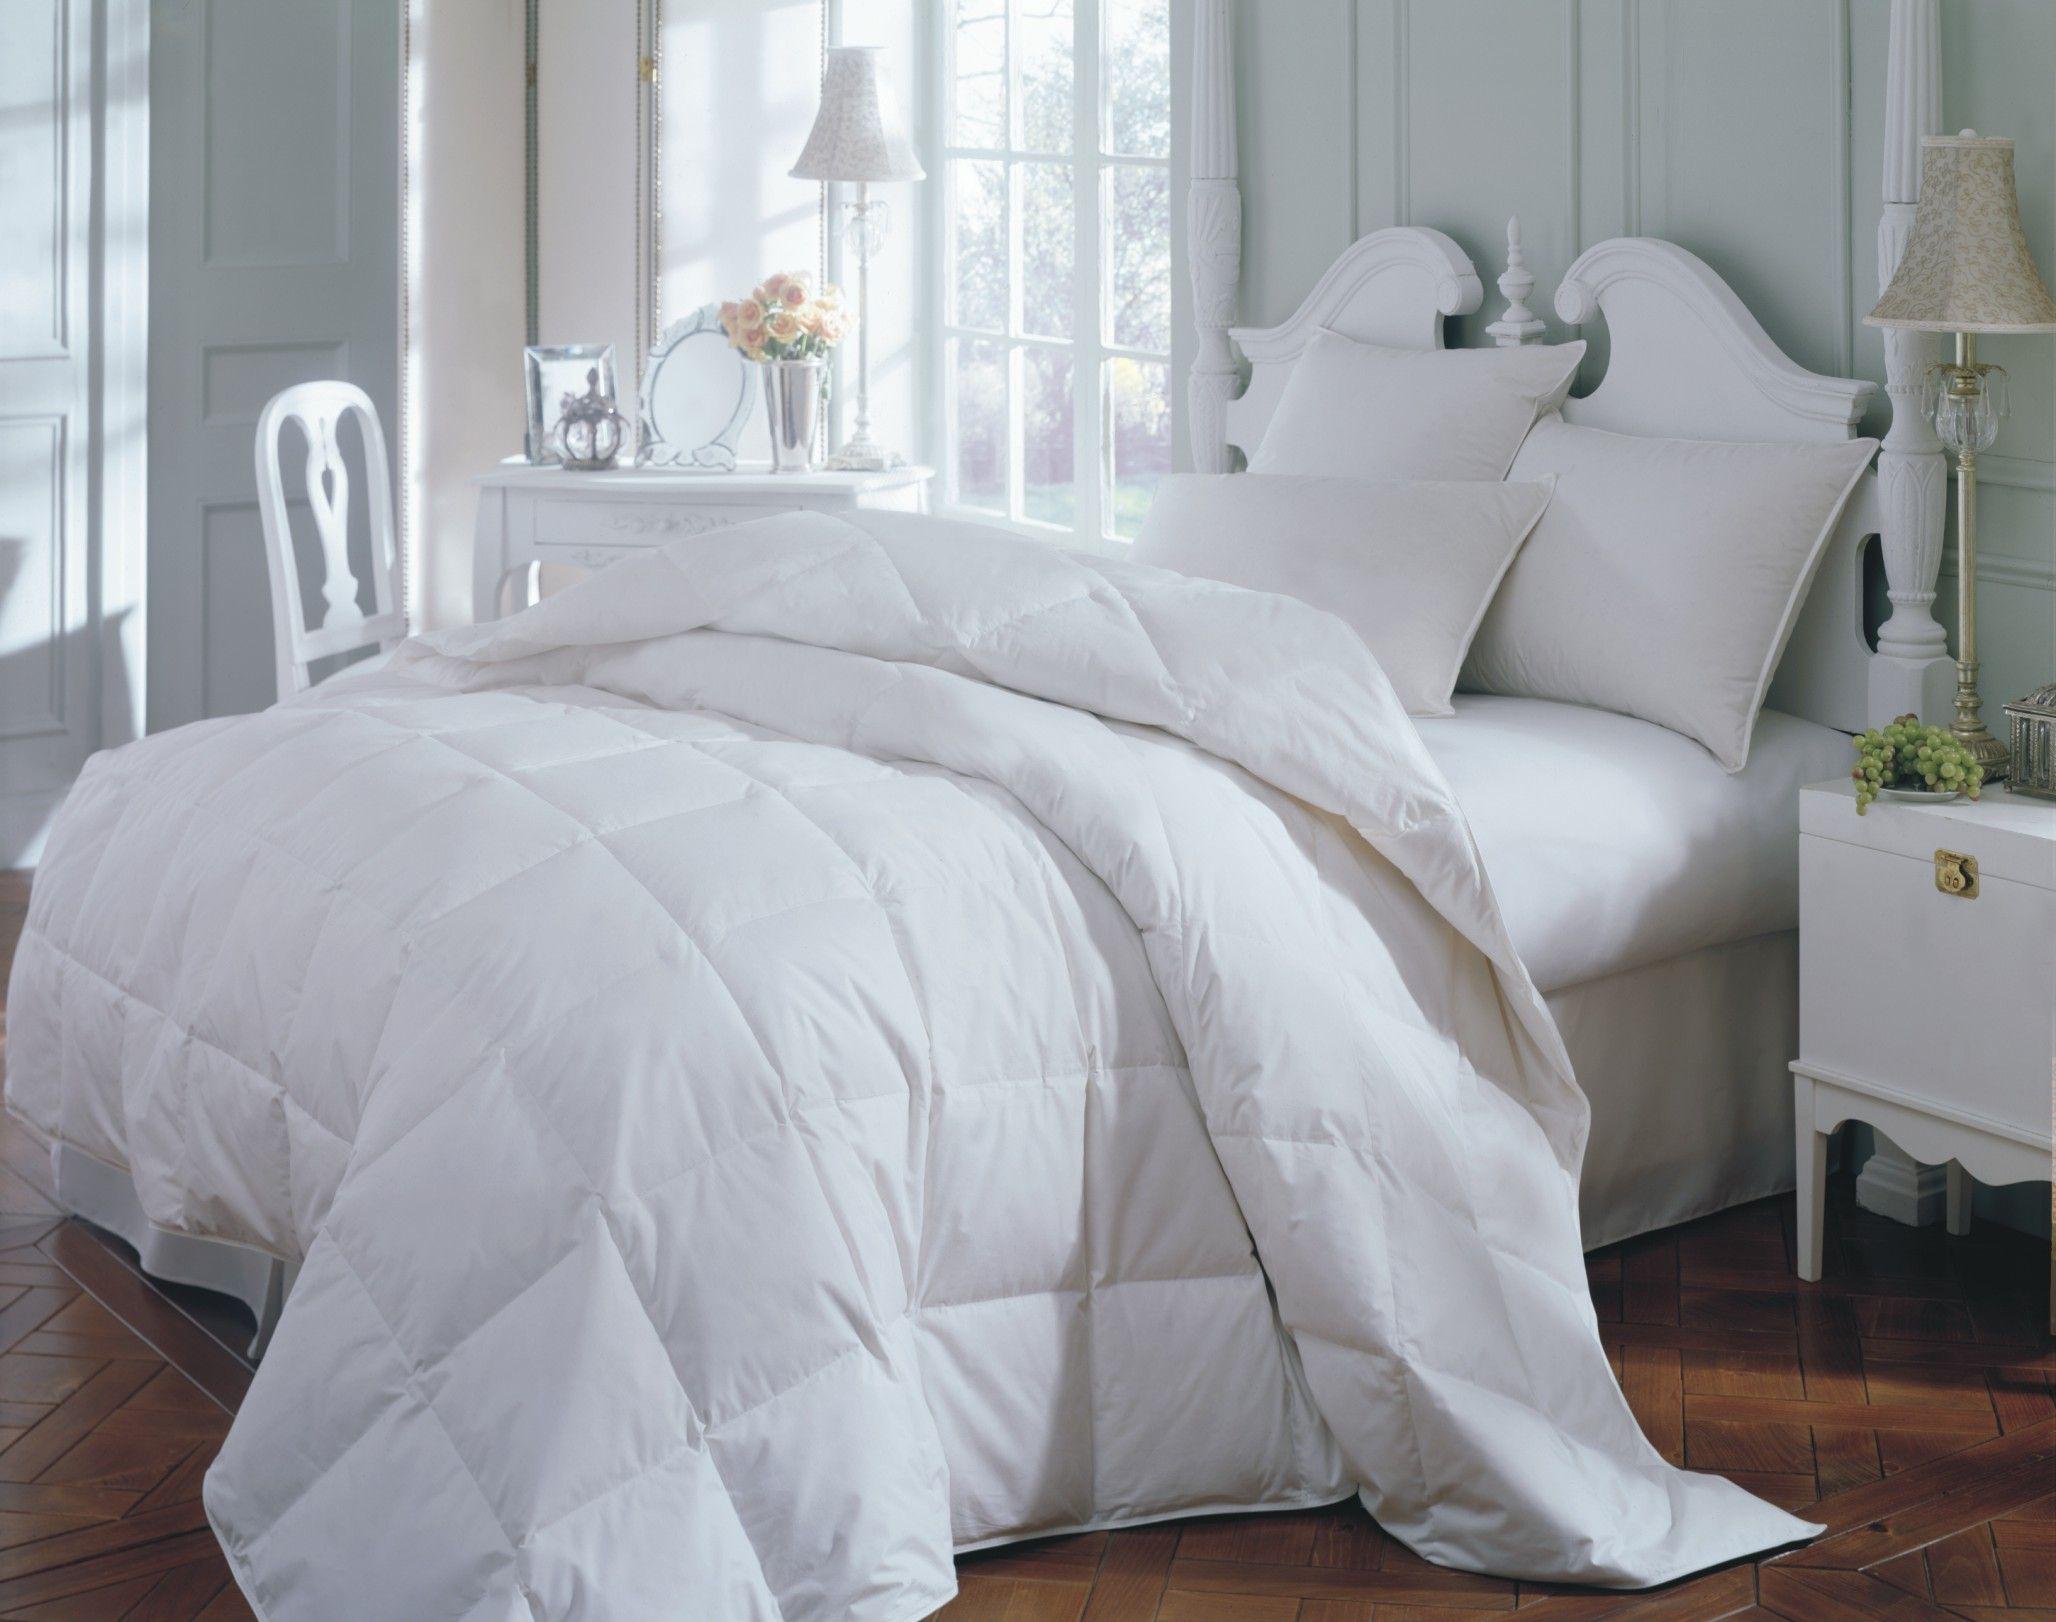 Bedding & Linens Sale | White down comforter, Down ...